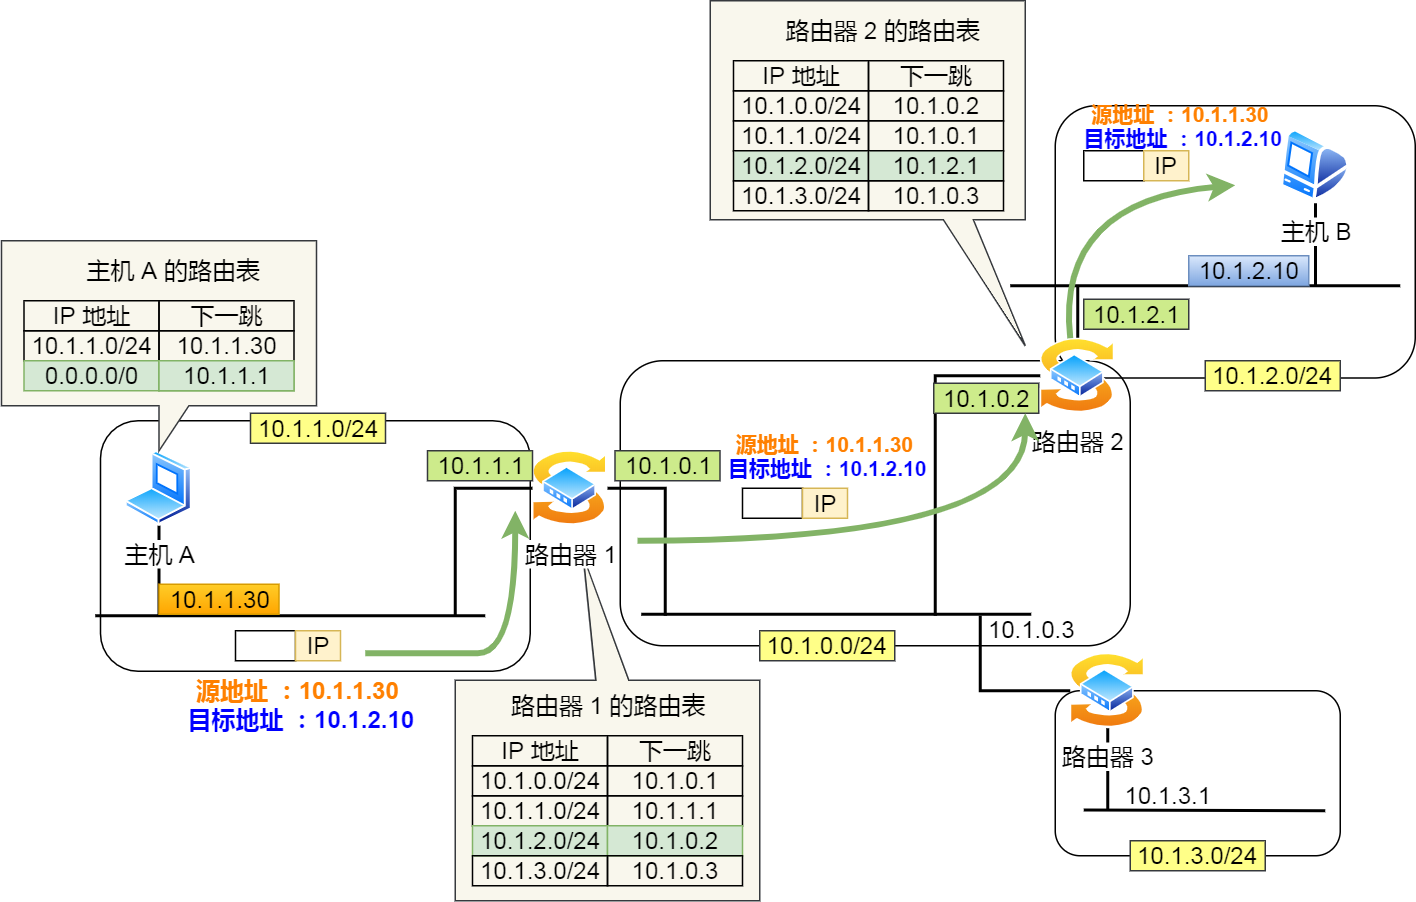 IP 地址与路由控制